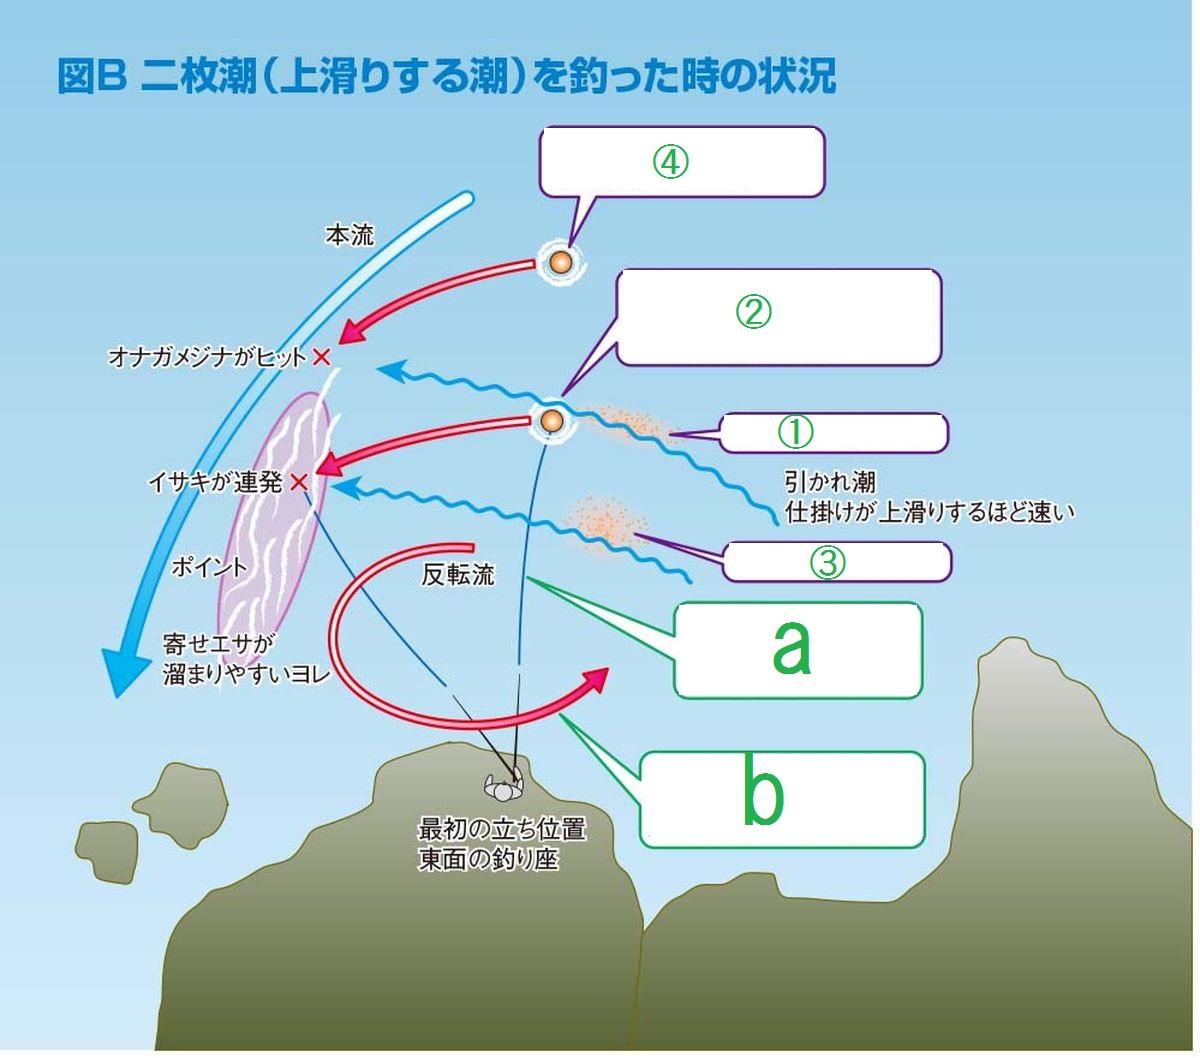 088-091tanaka-highteku_cs6 (19)